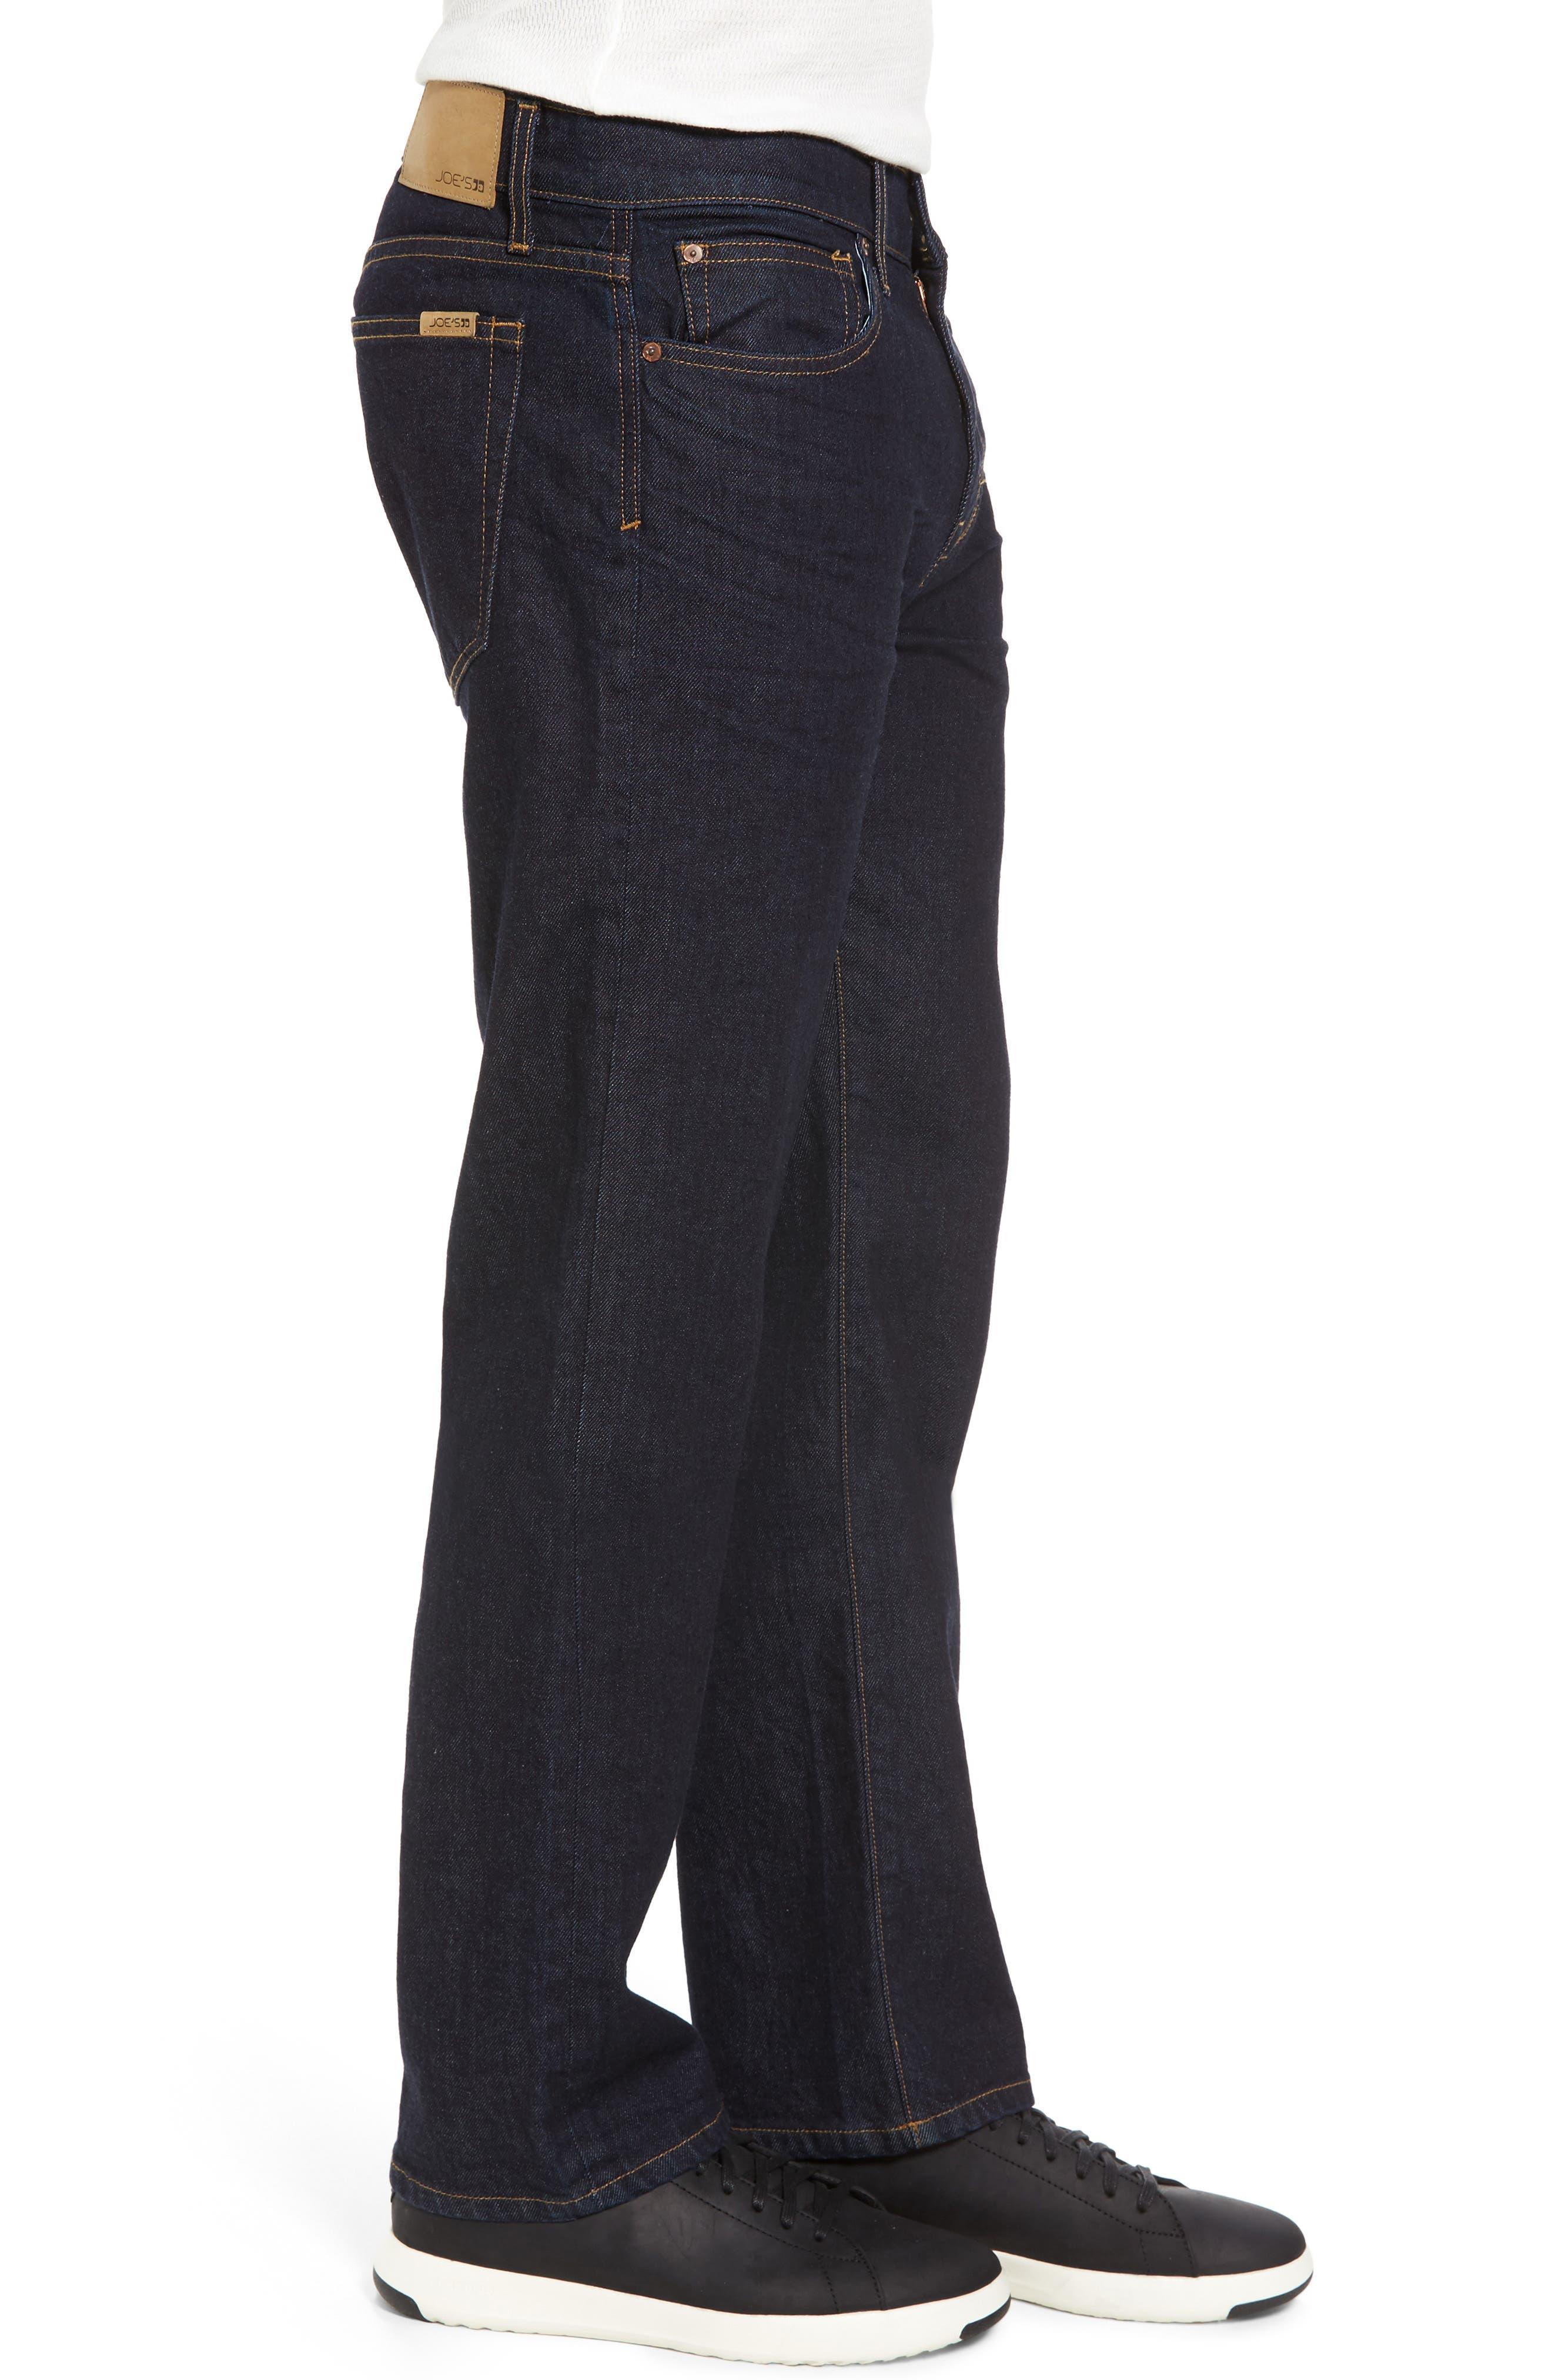 Brixton Slim Straight Leg Jeans,                             Alternate thumbnail 3, color,                             400